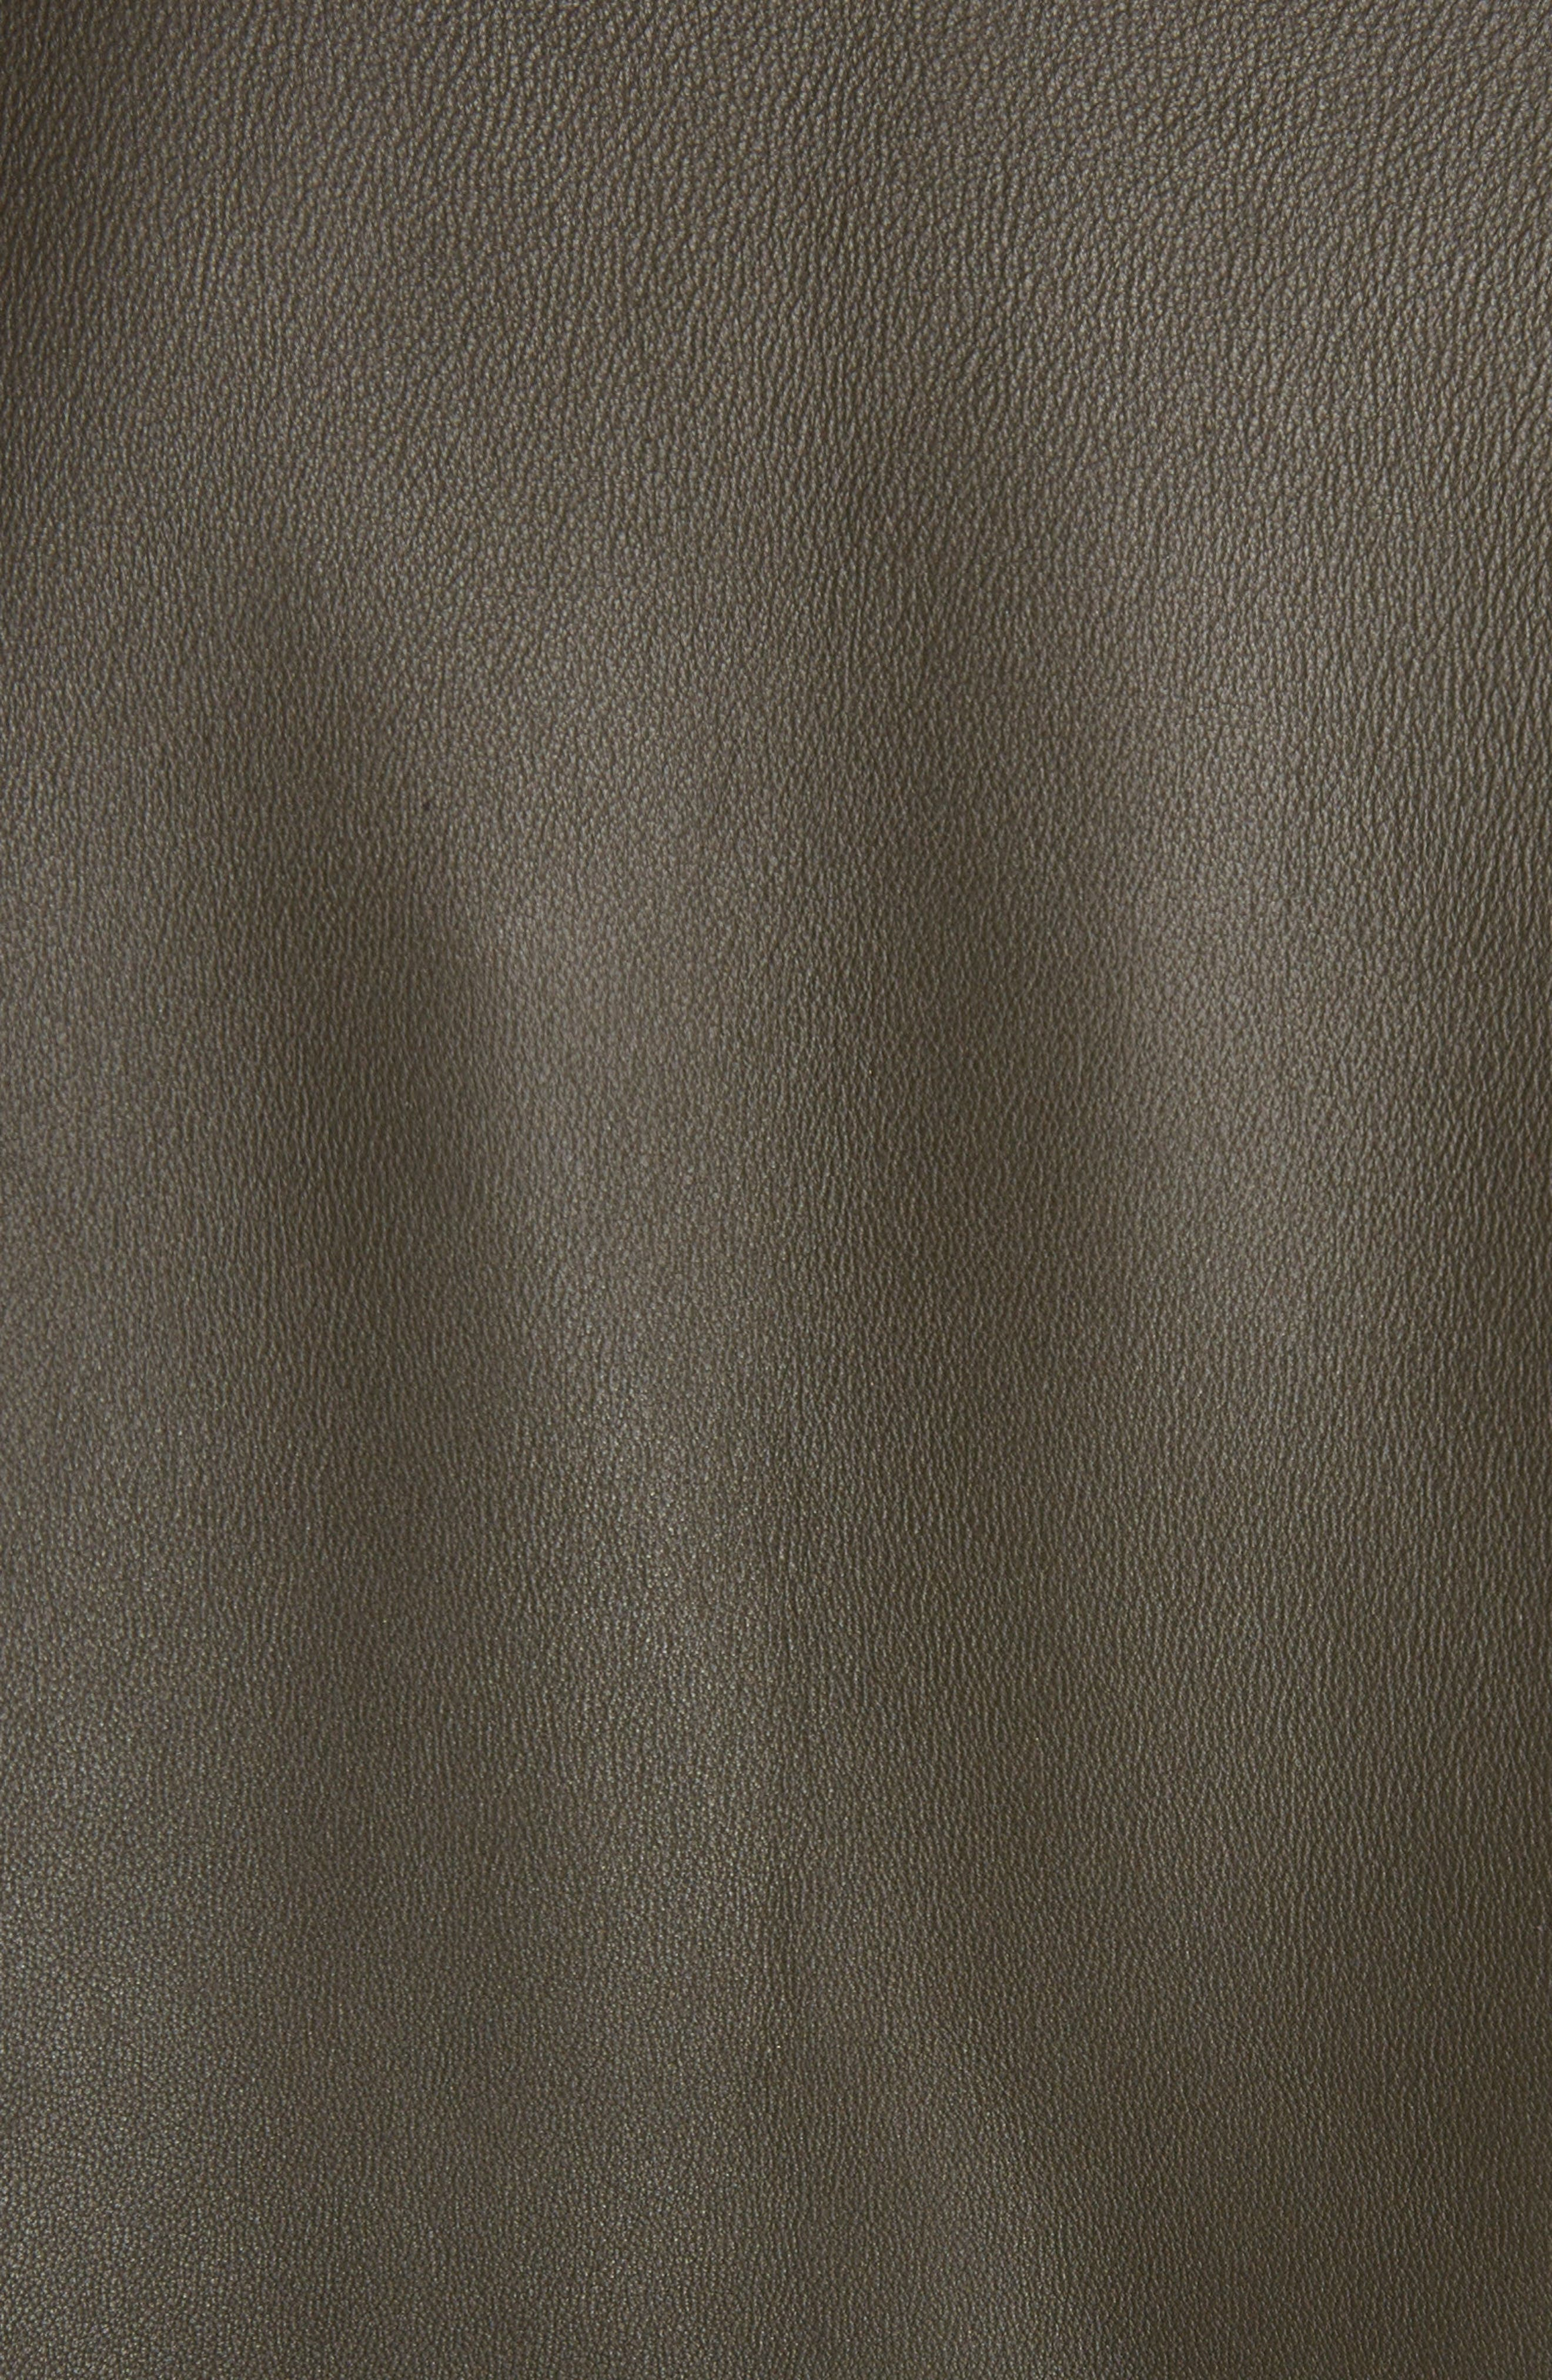 Myrtle Leather Jacket,                             Alternate thumbnail 6, color,                             Dark Khaki